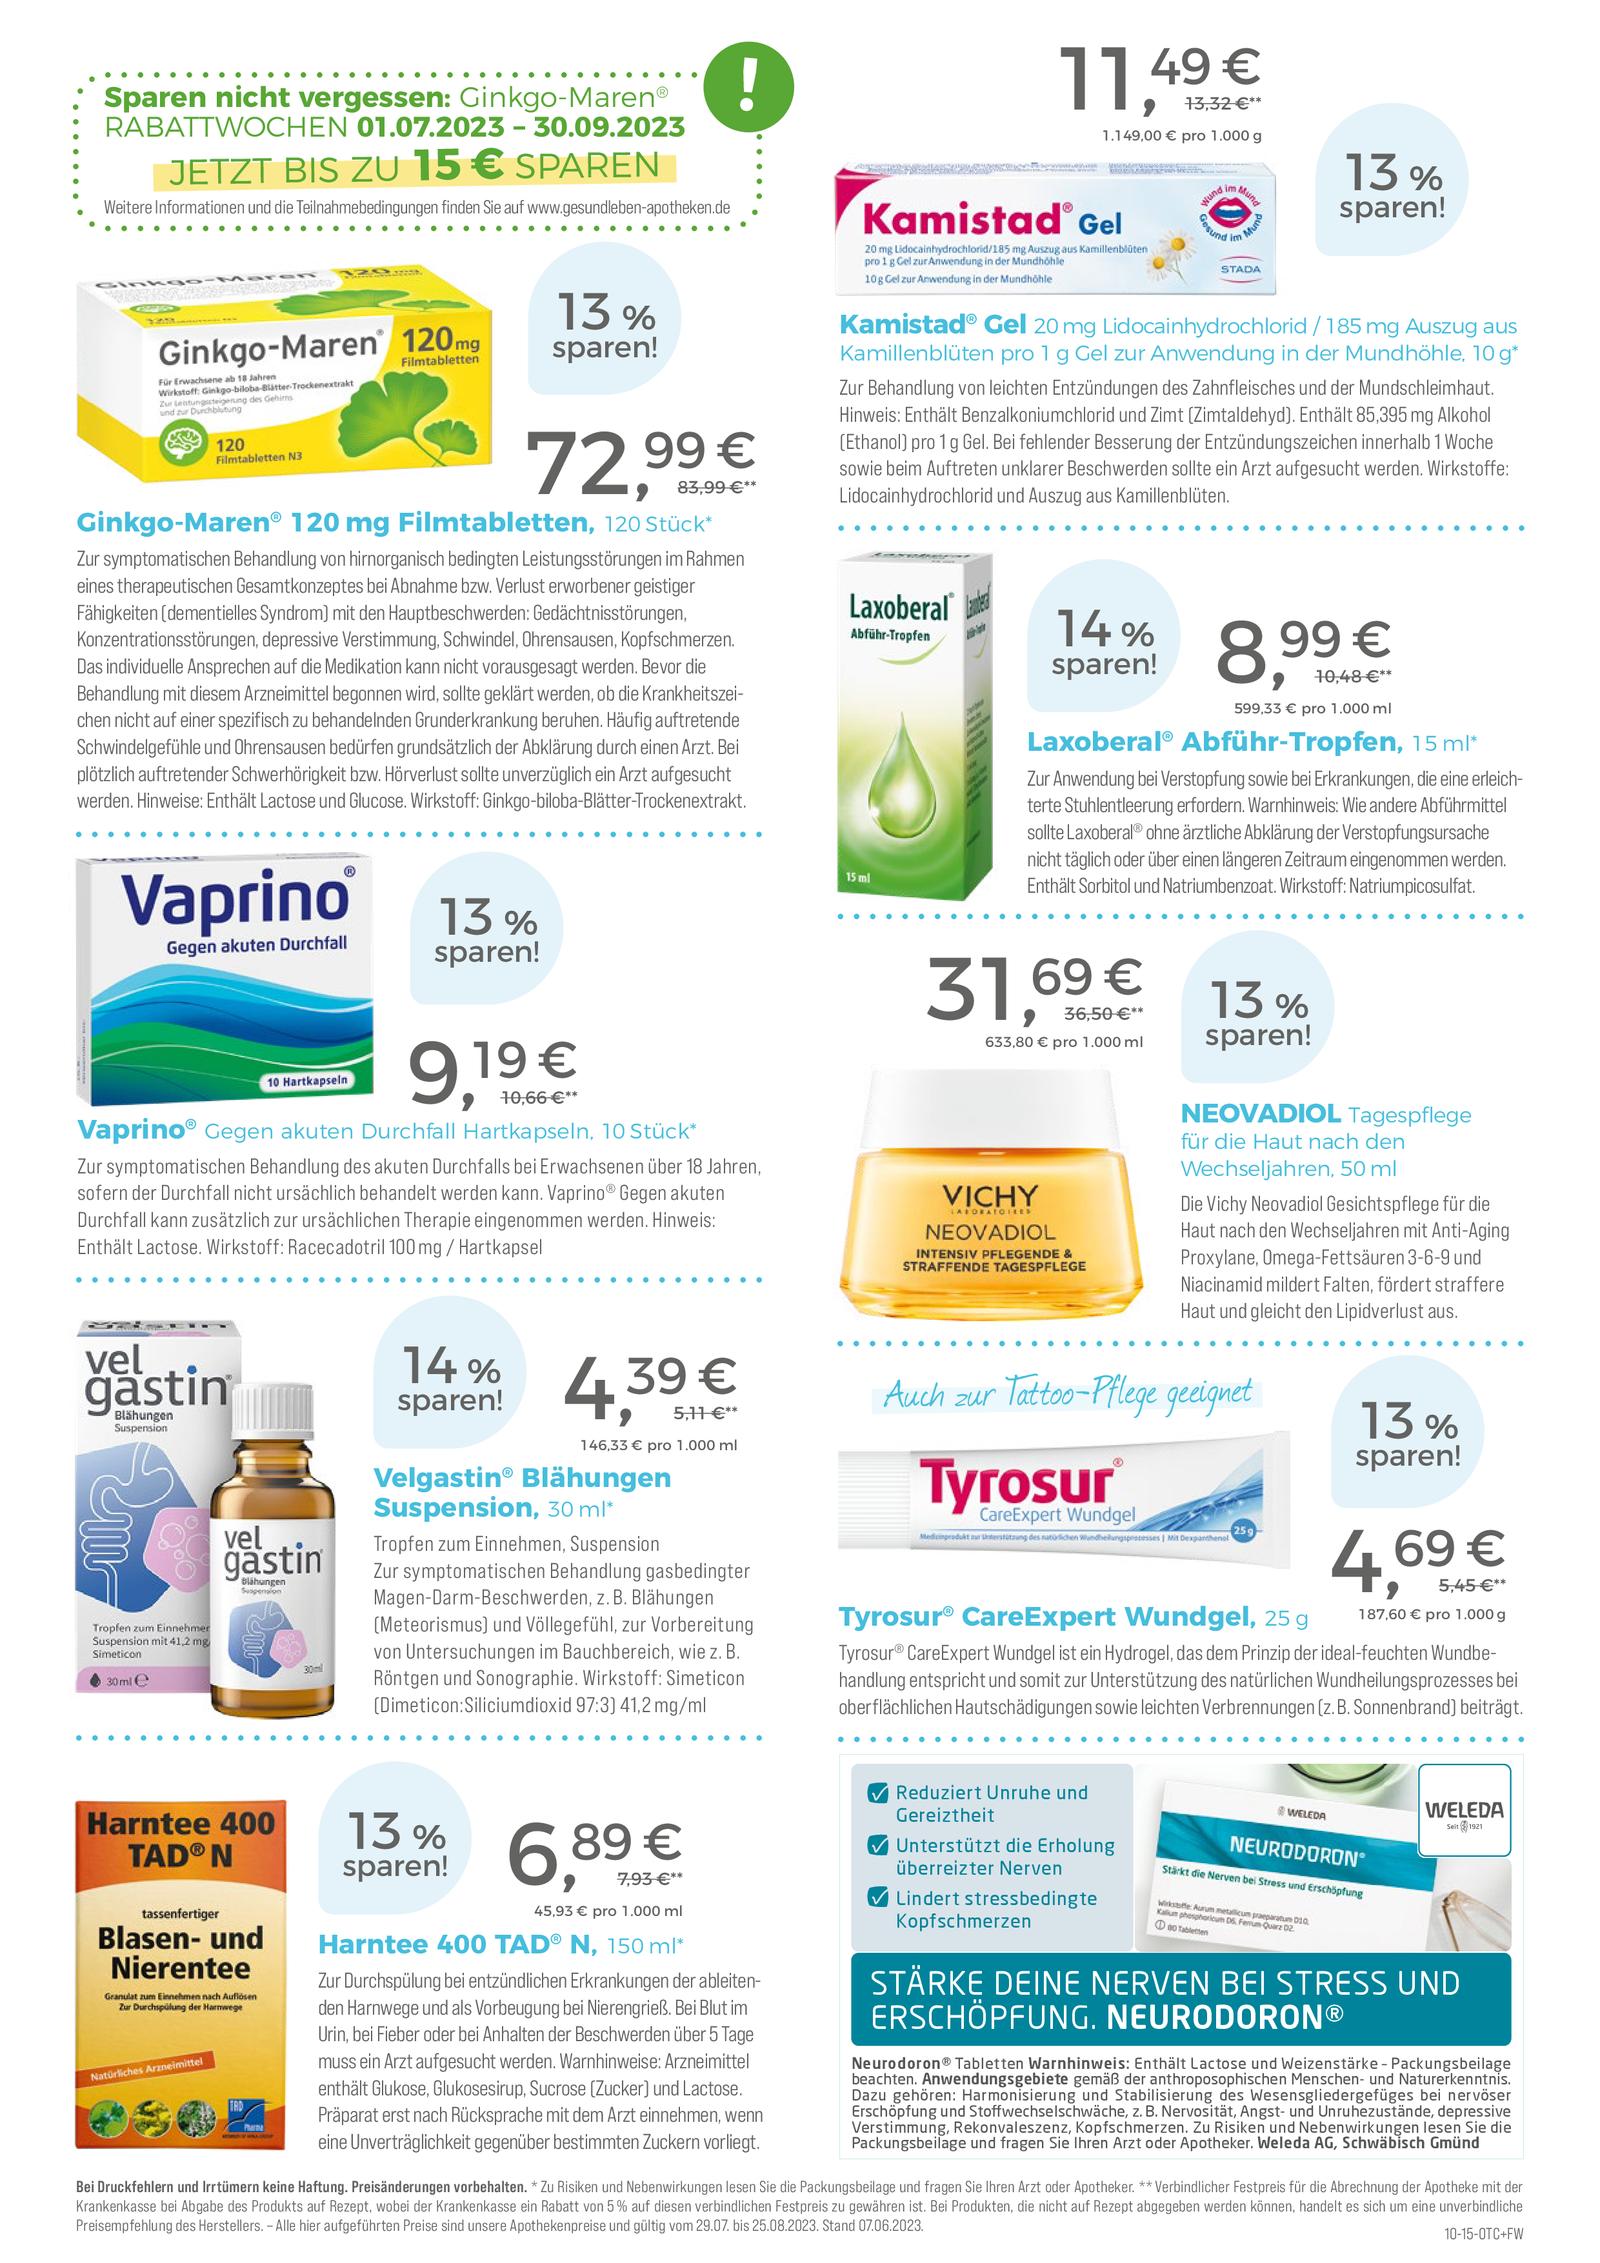 https://mein-uploads.apocdn.net/20016/leaflets/gesundleben_niedrig-Seite3.png